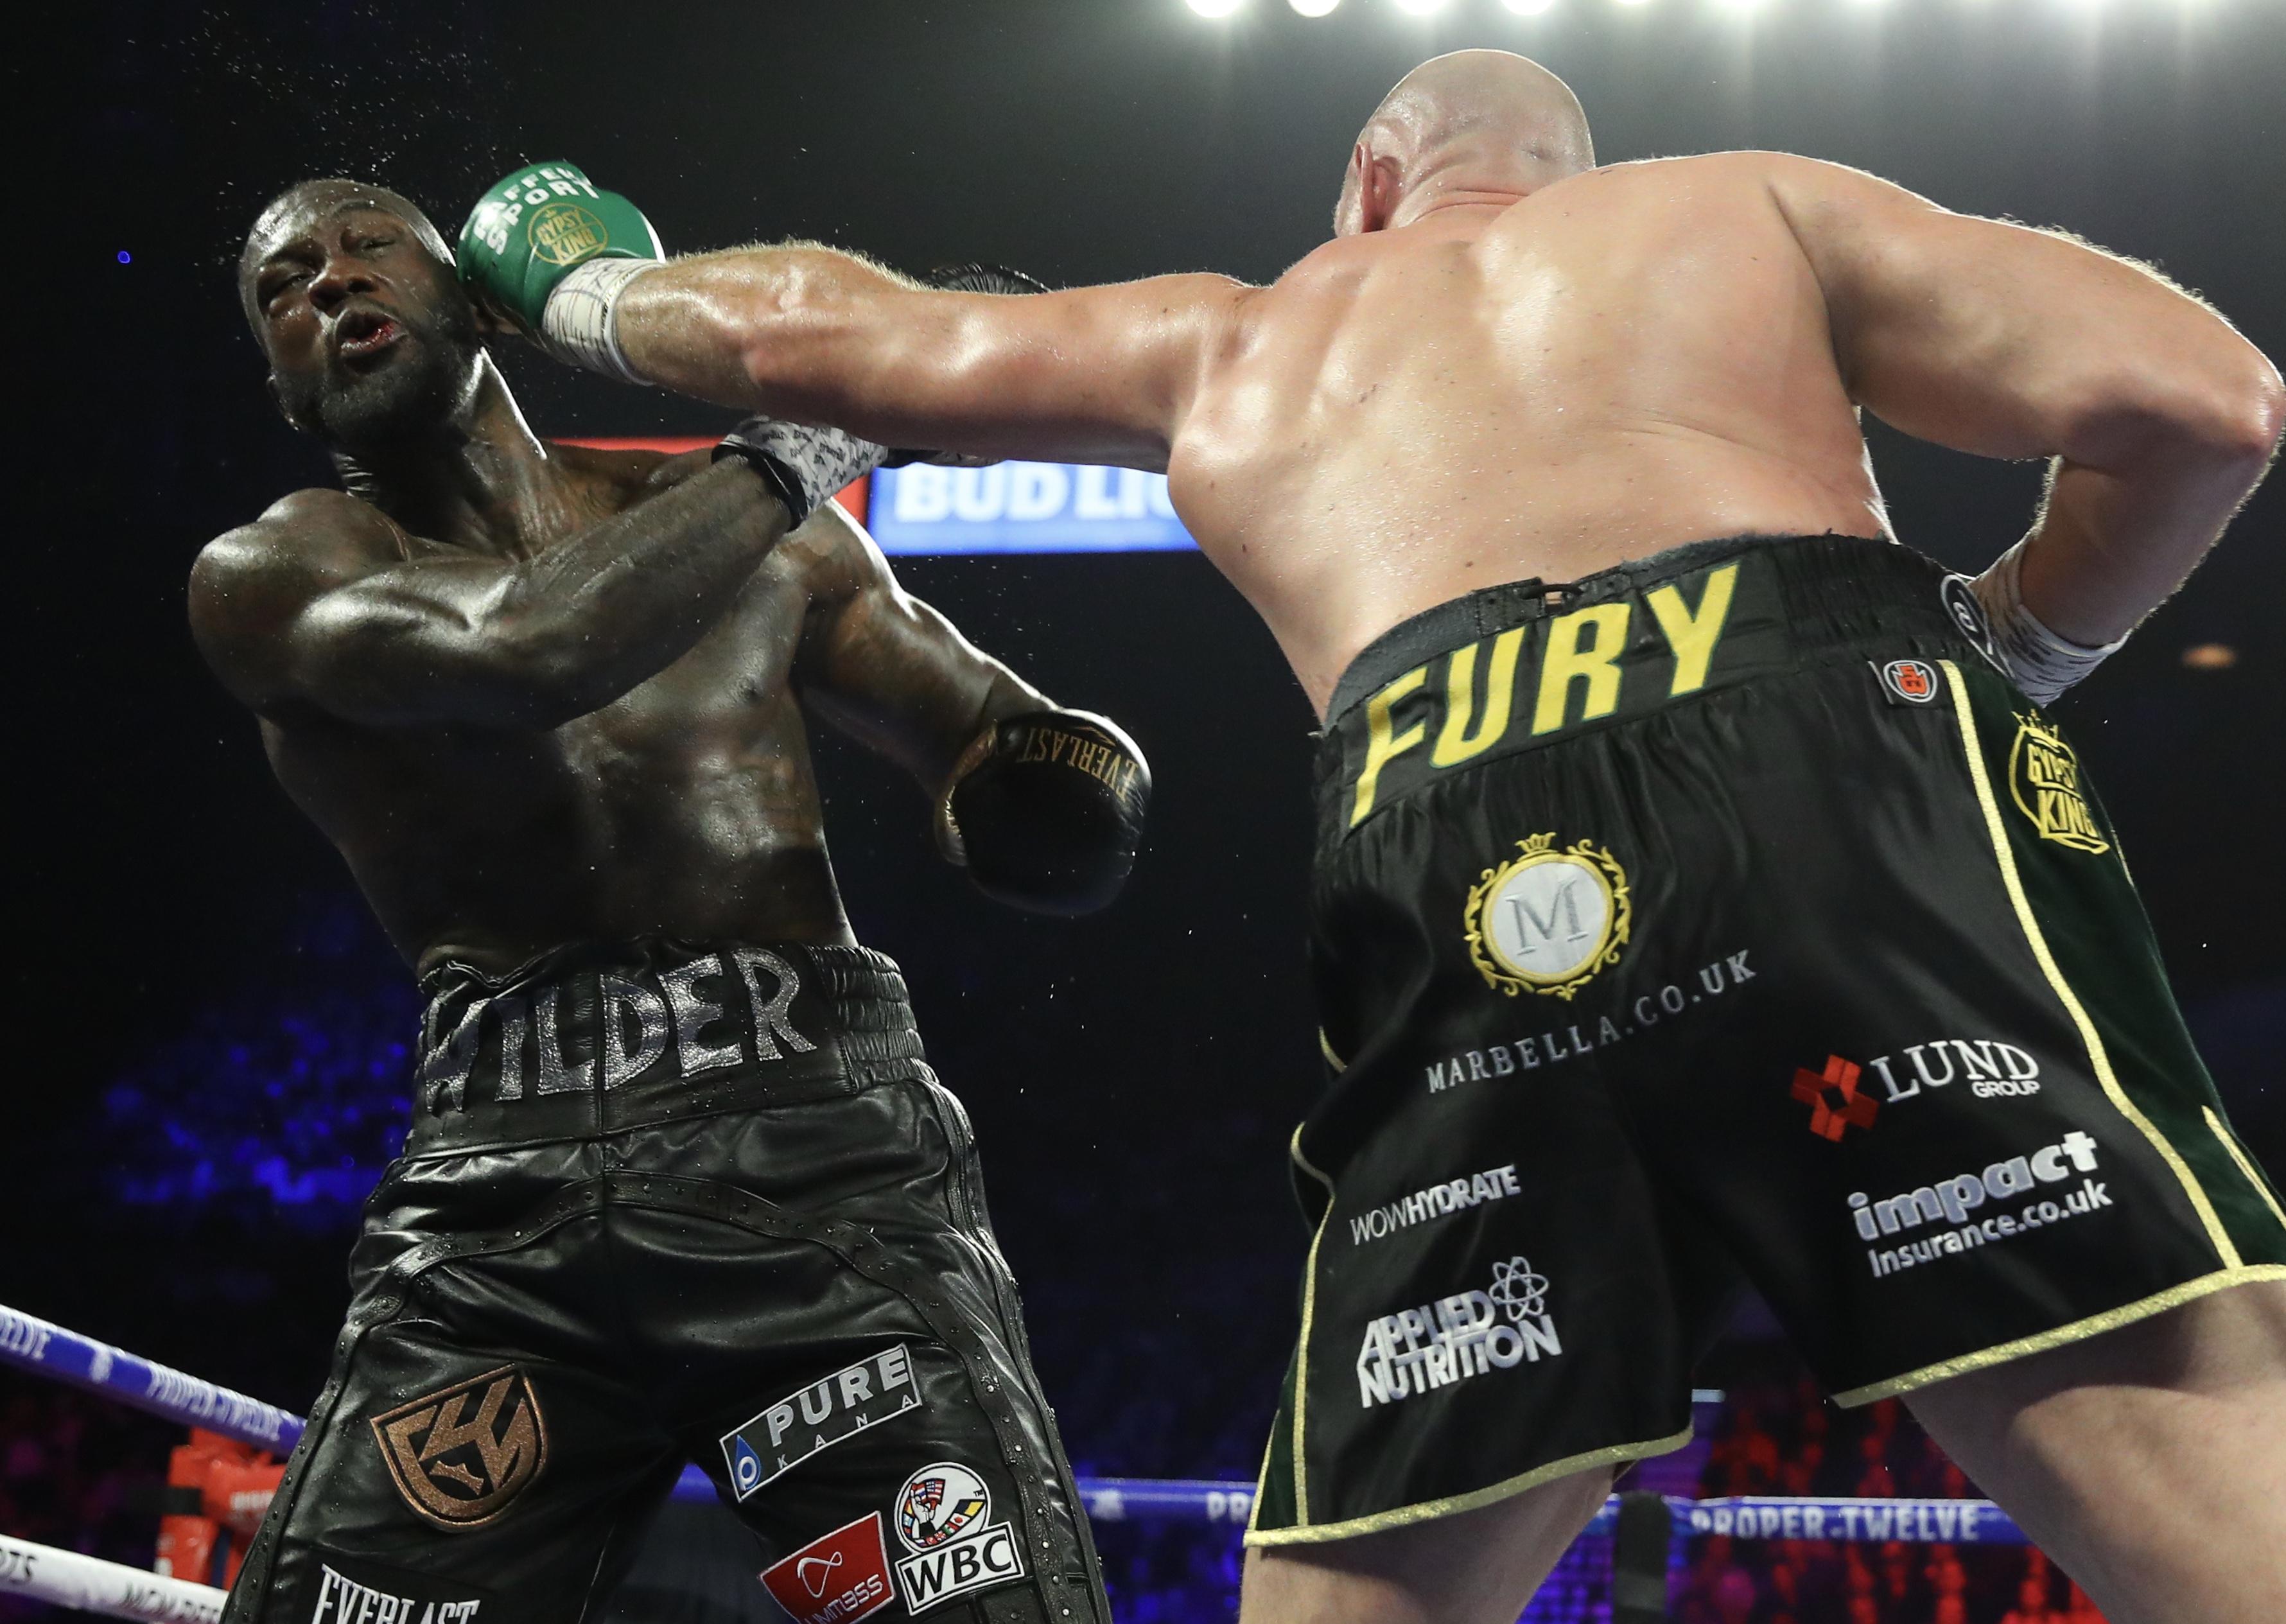 Deontay_Wilder_vs_Tyson_Fury_0740.JPG